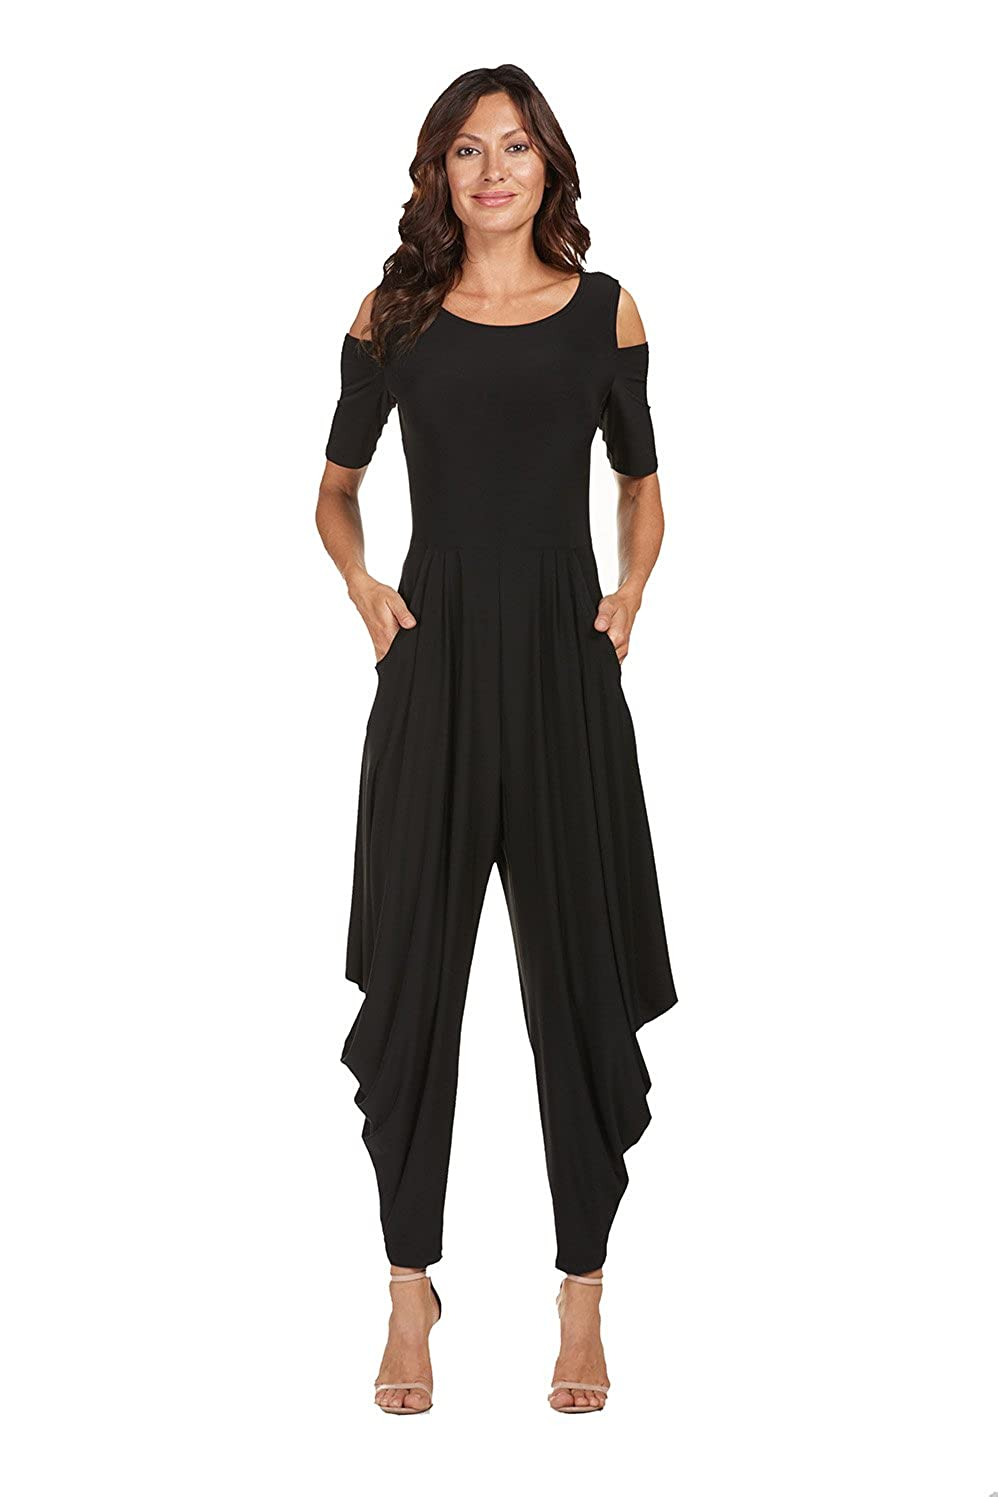 Frank Lyman Women's Jumpsuit Style 176074 Black